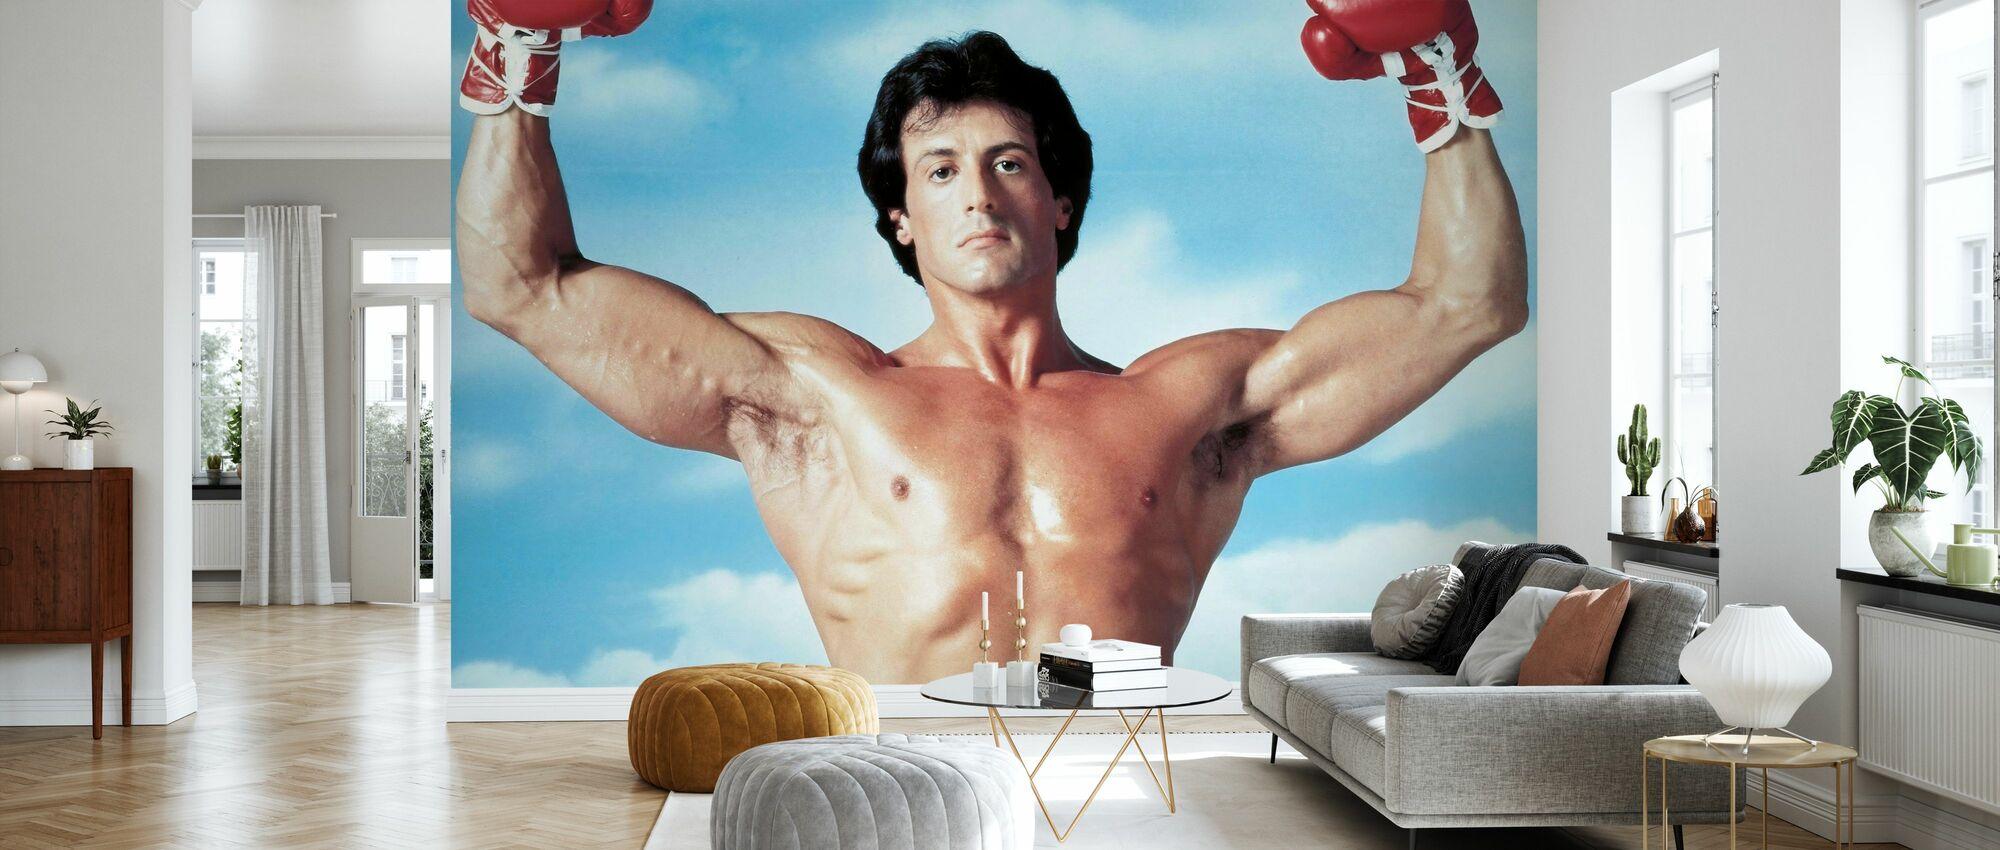 Rocky III - Sylvester Stallone - Wallpaper - Living Room